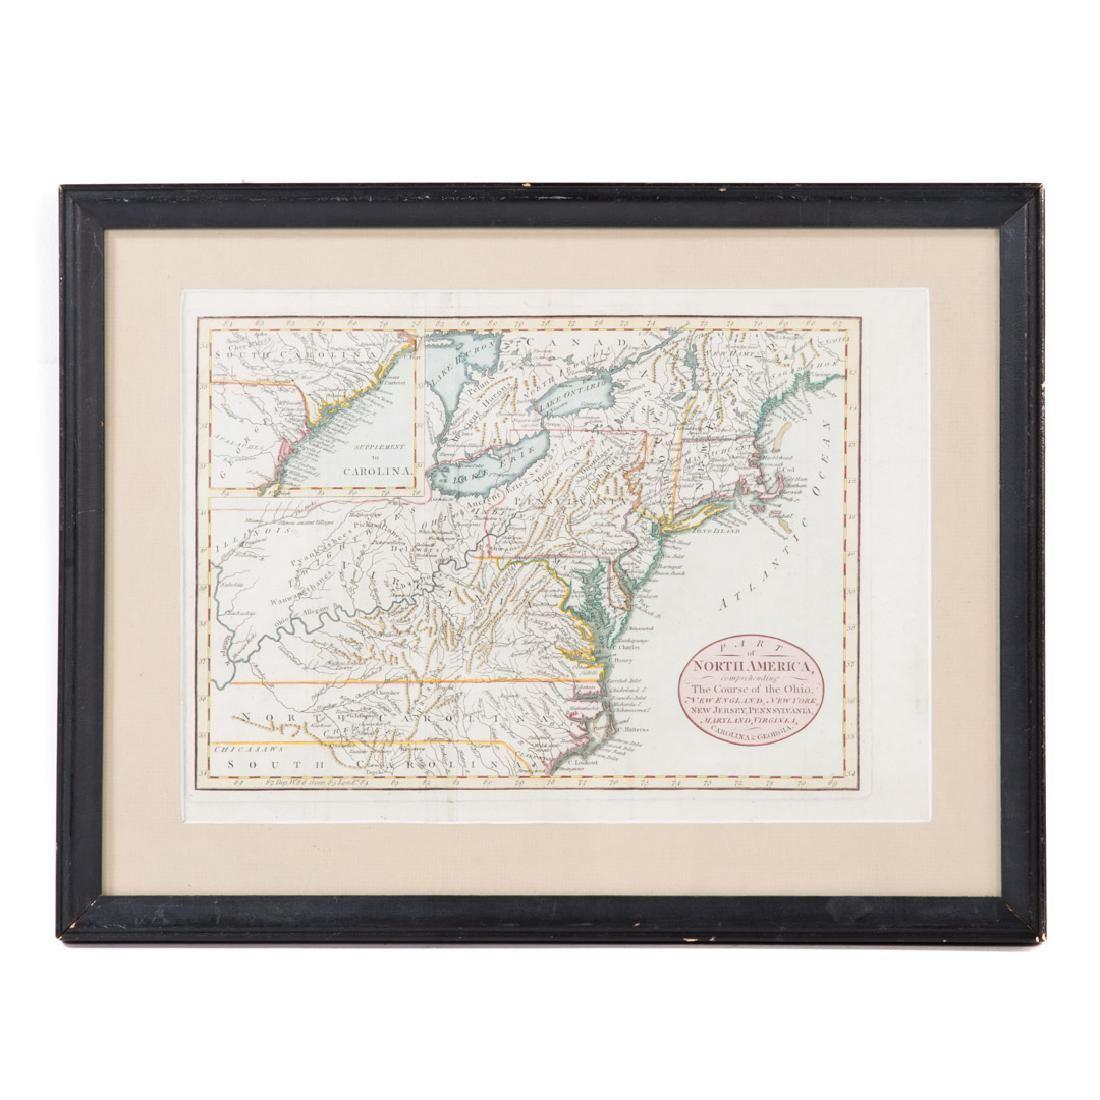 John Carey. North America map